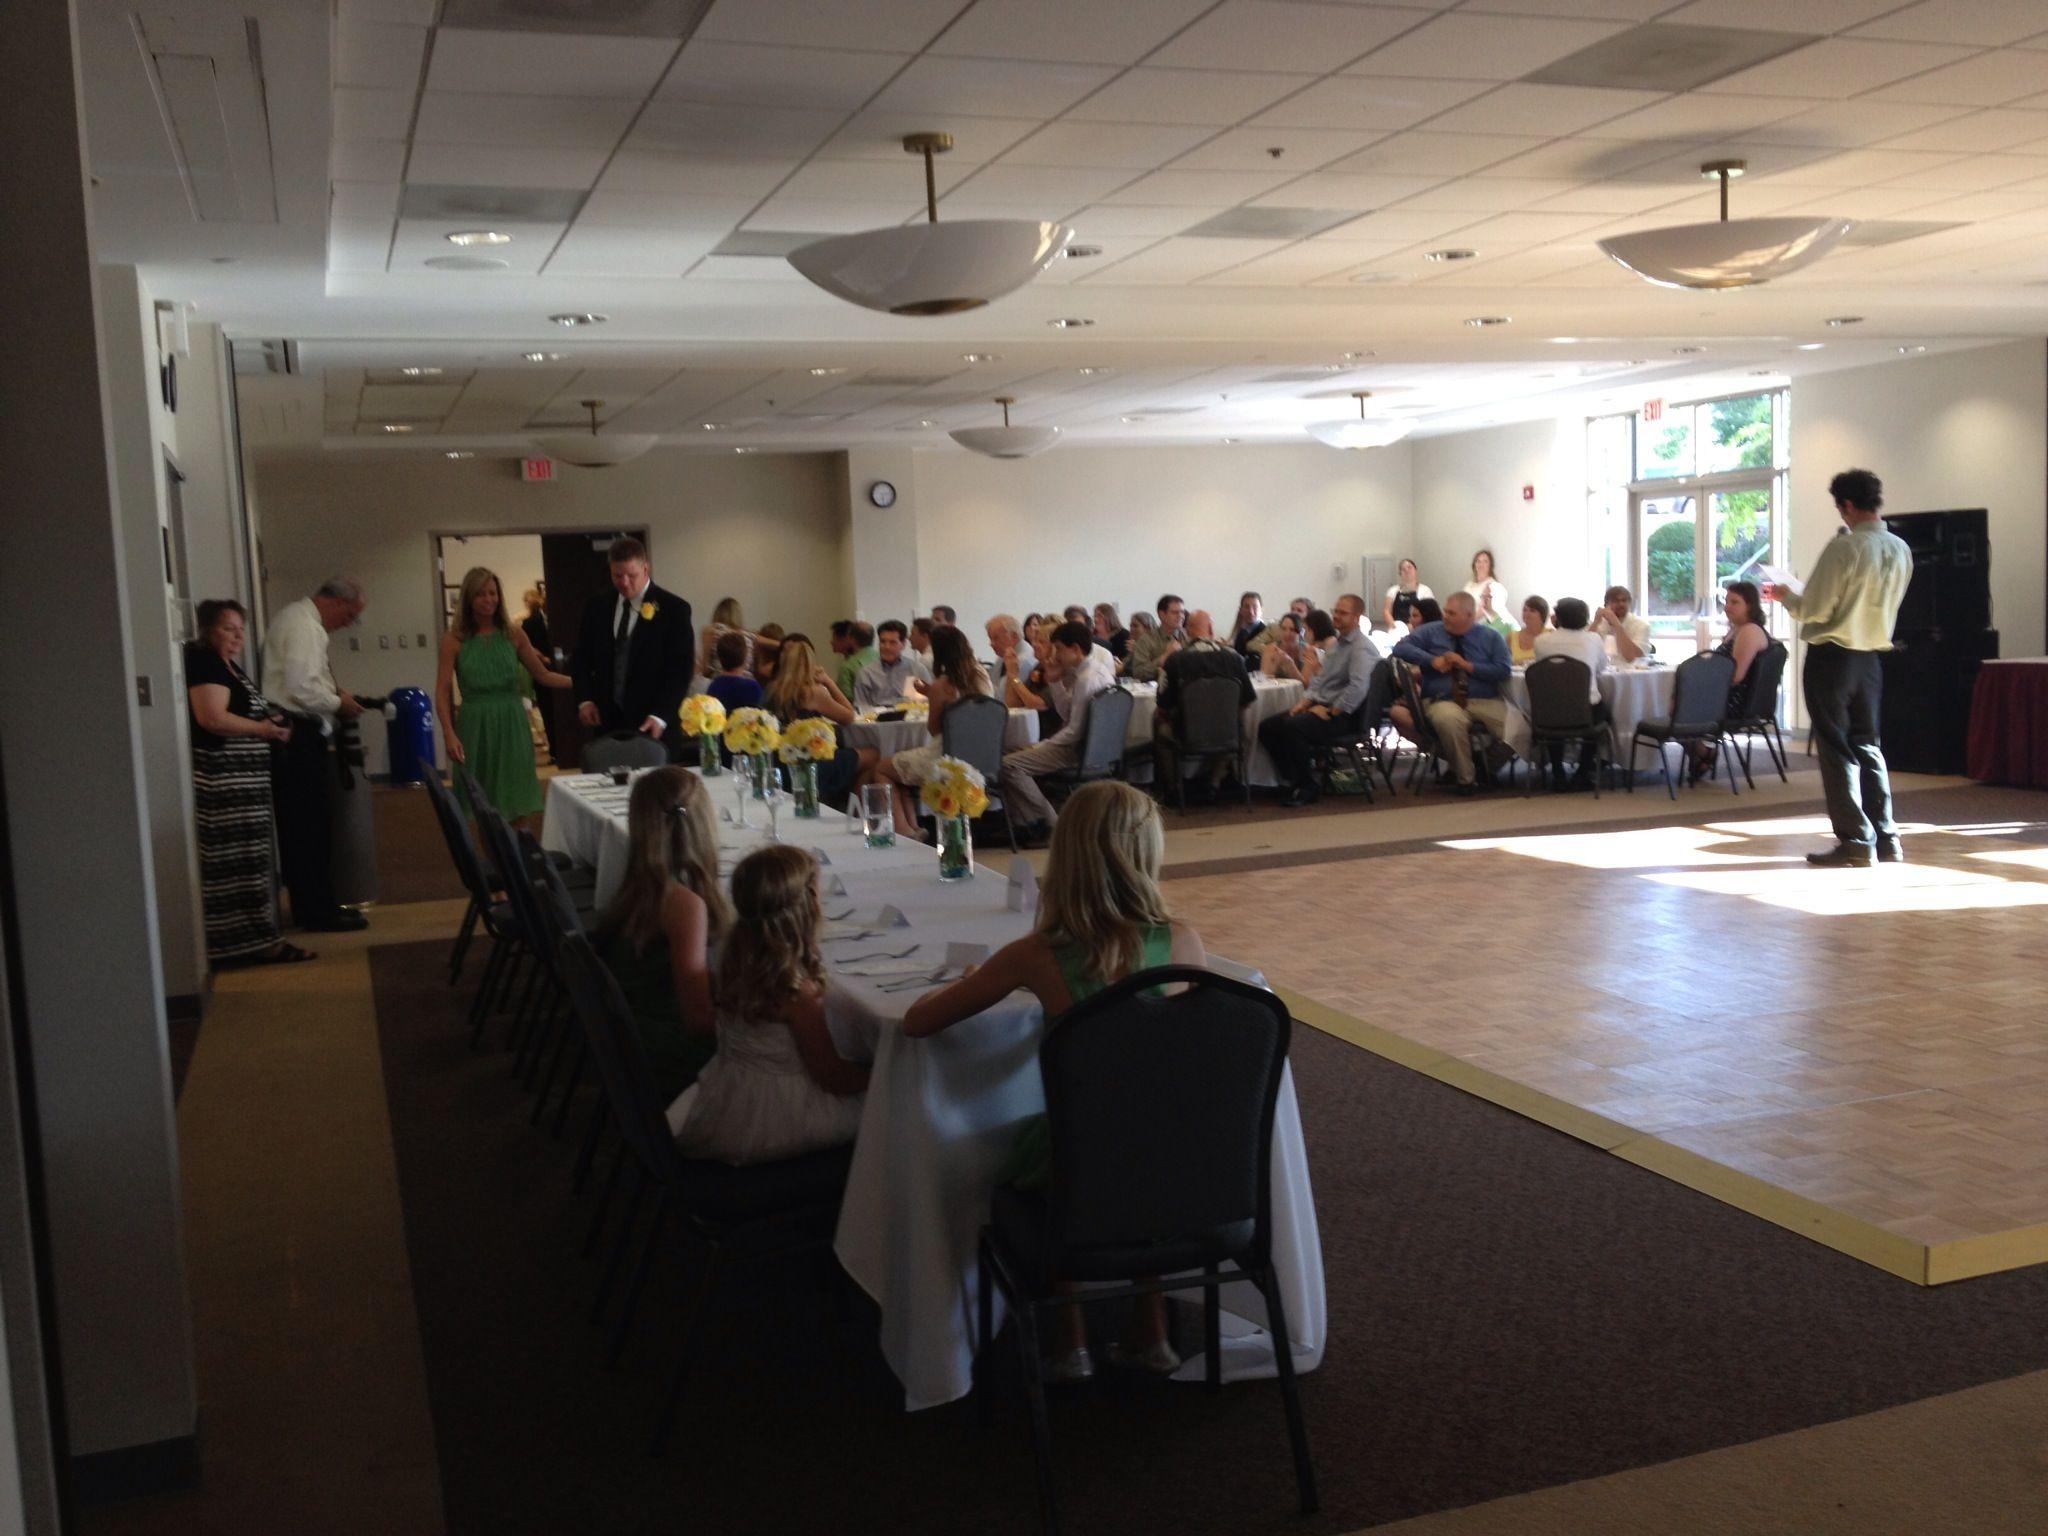 Economical Wedding Reception Venue Rental At Ida Lee Recreation Center In Leesburg VA